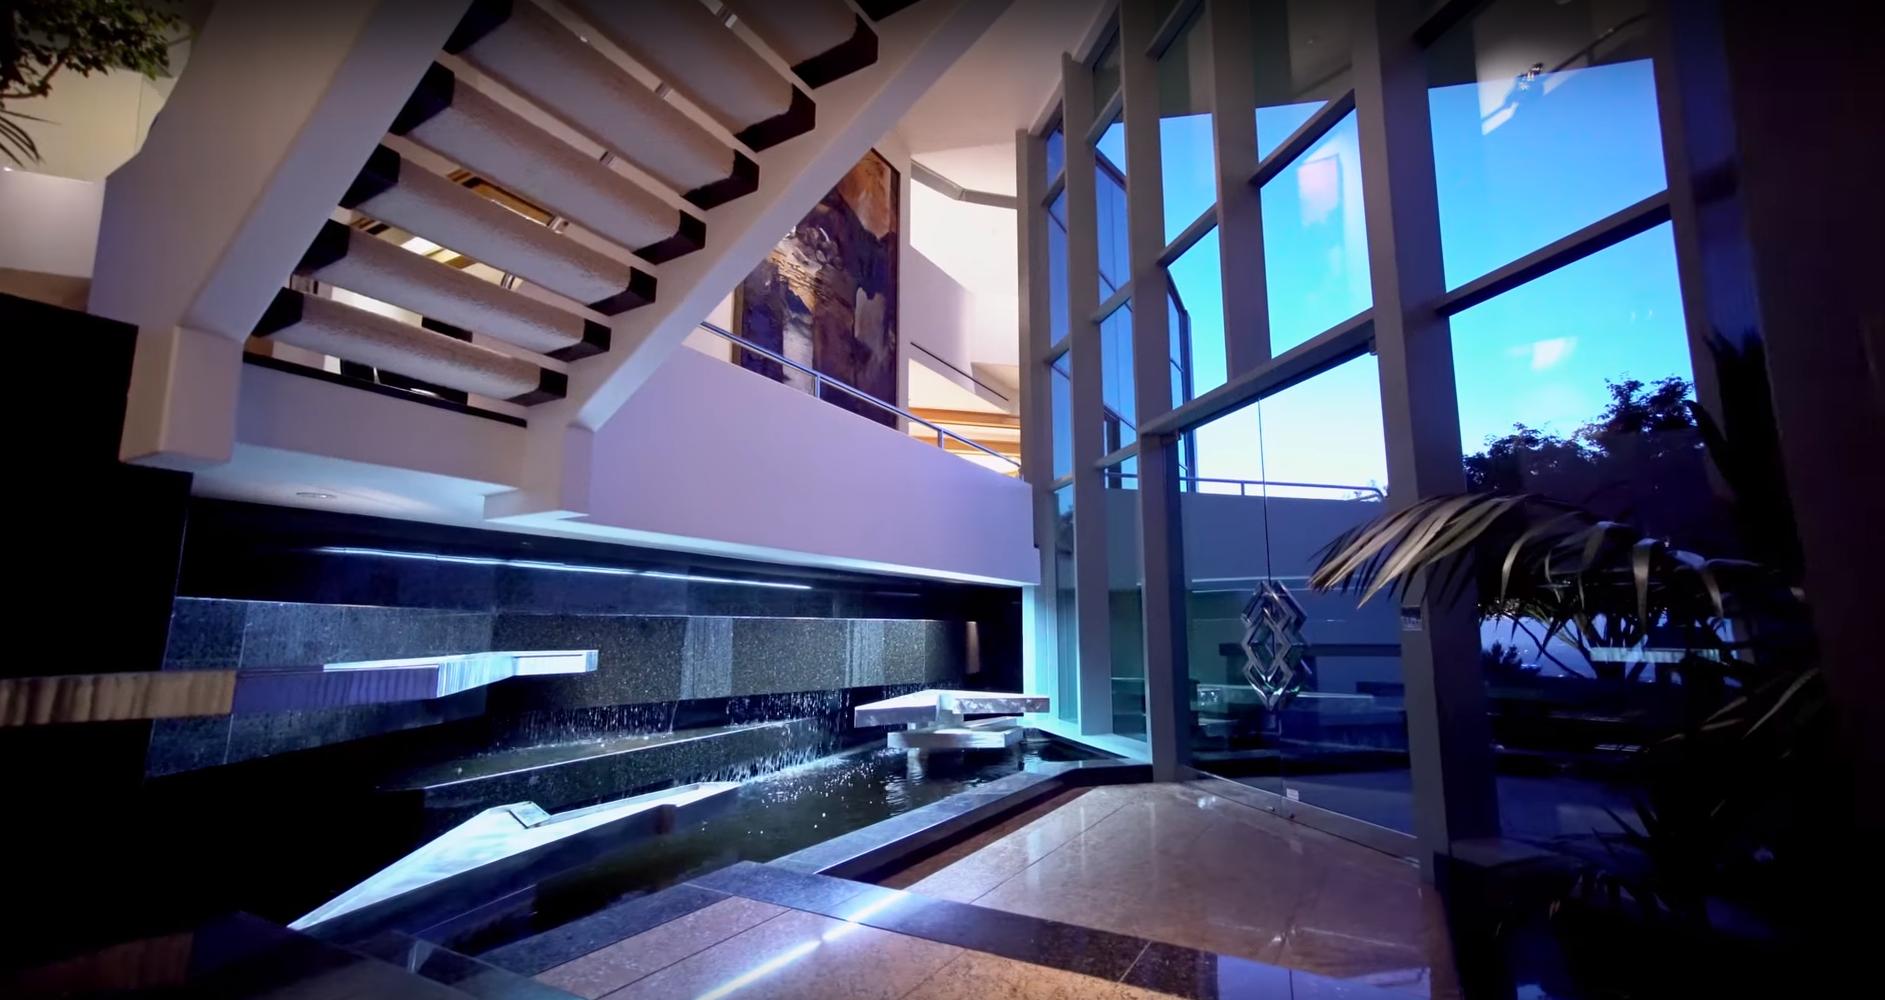 Pharrell Williams' interior water features